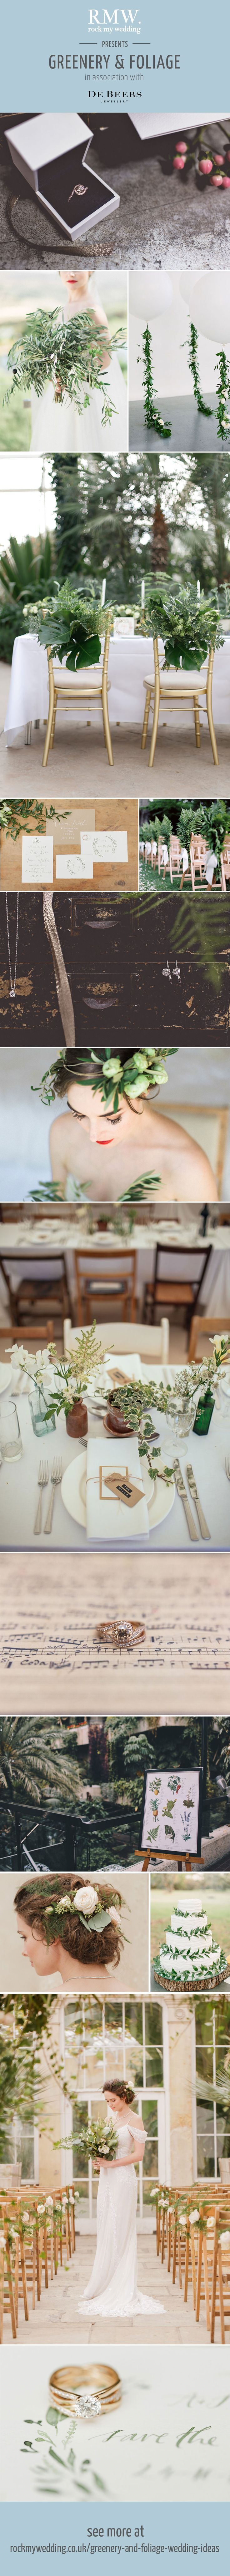 Greenery & Foliage Wedding Decor | Wedding Ideas | Wedding inspiration | http://www.rockmywedding.co.uk/greenery-and-foliage-wedding-ideas/